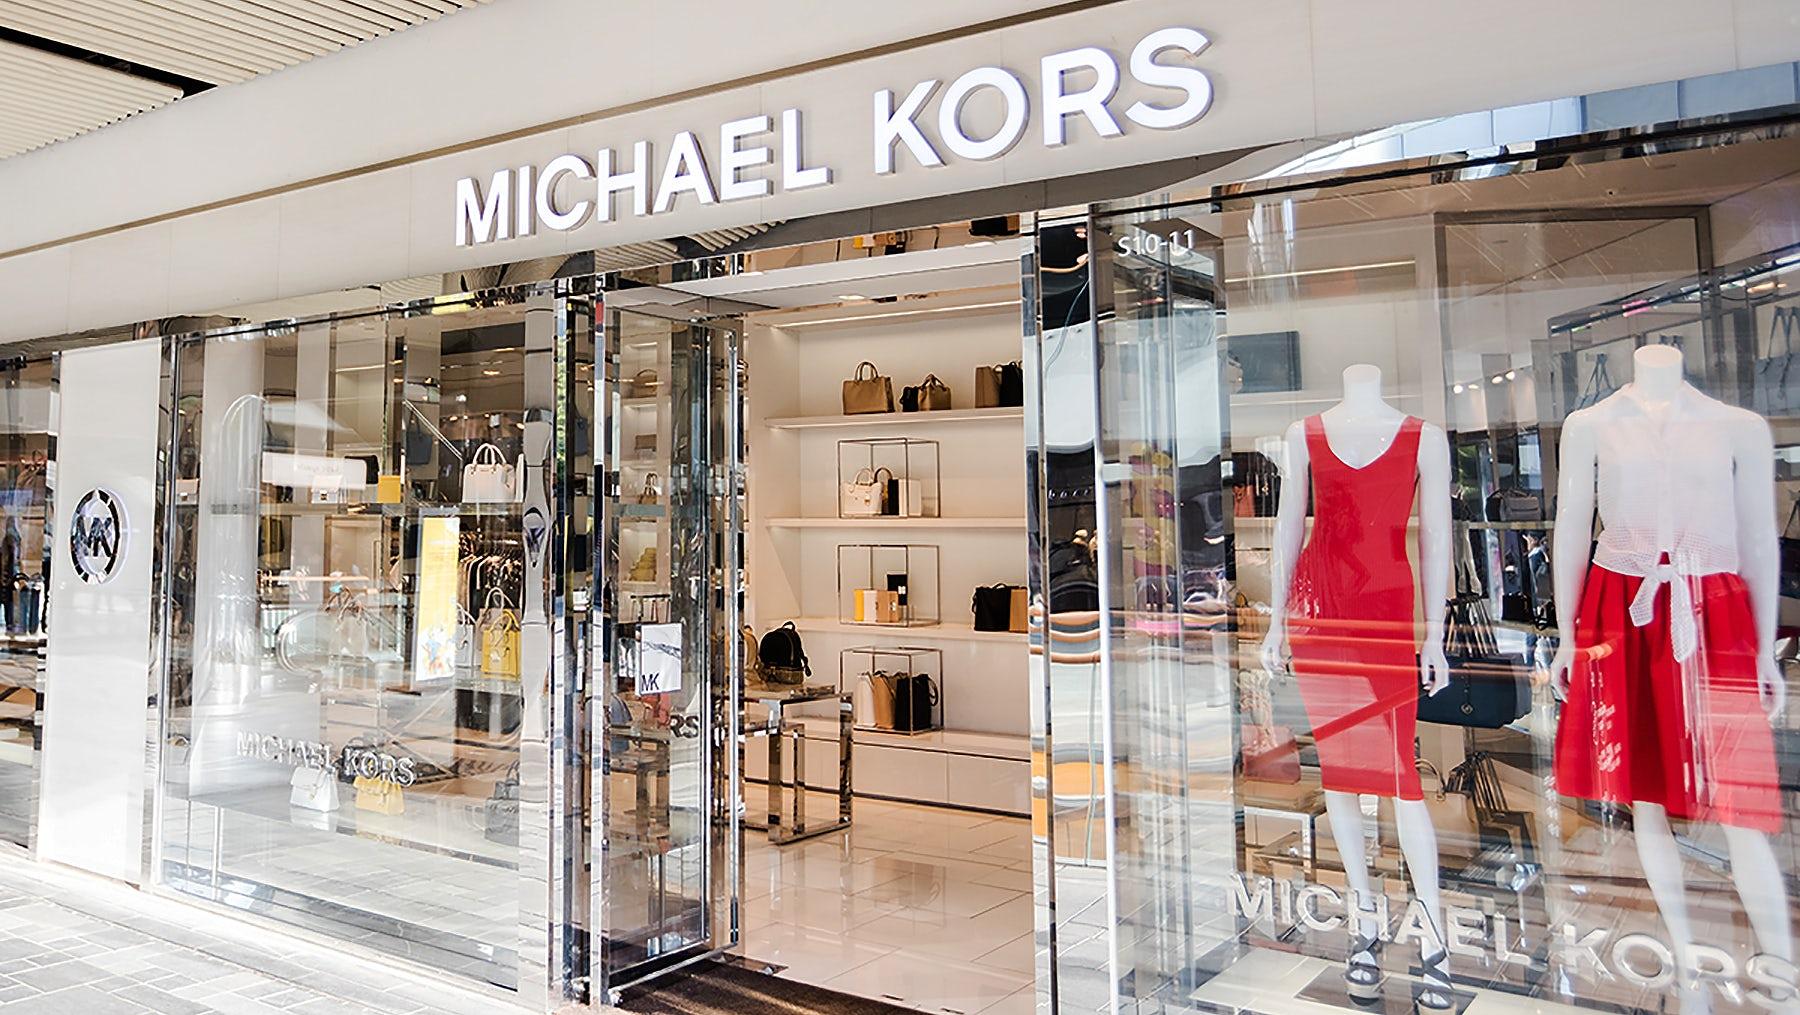 Michael Kors store | Source: Shutterstock